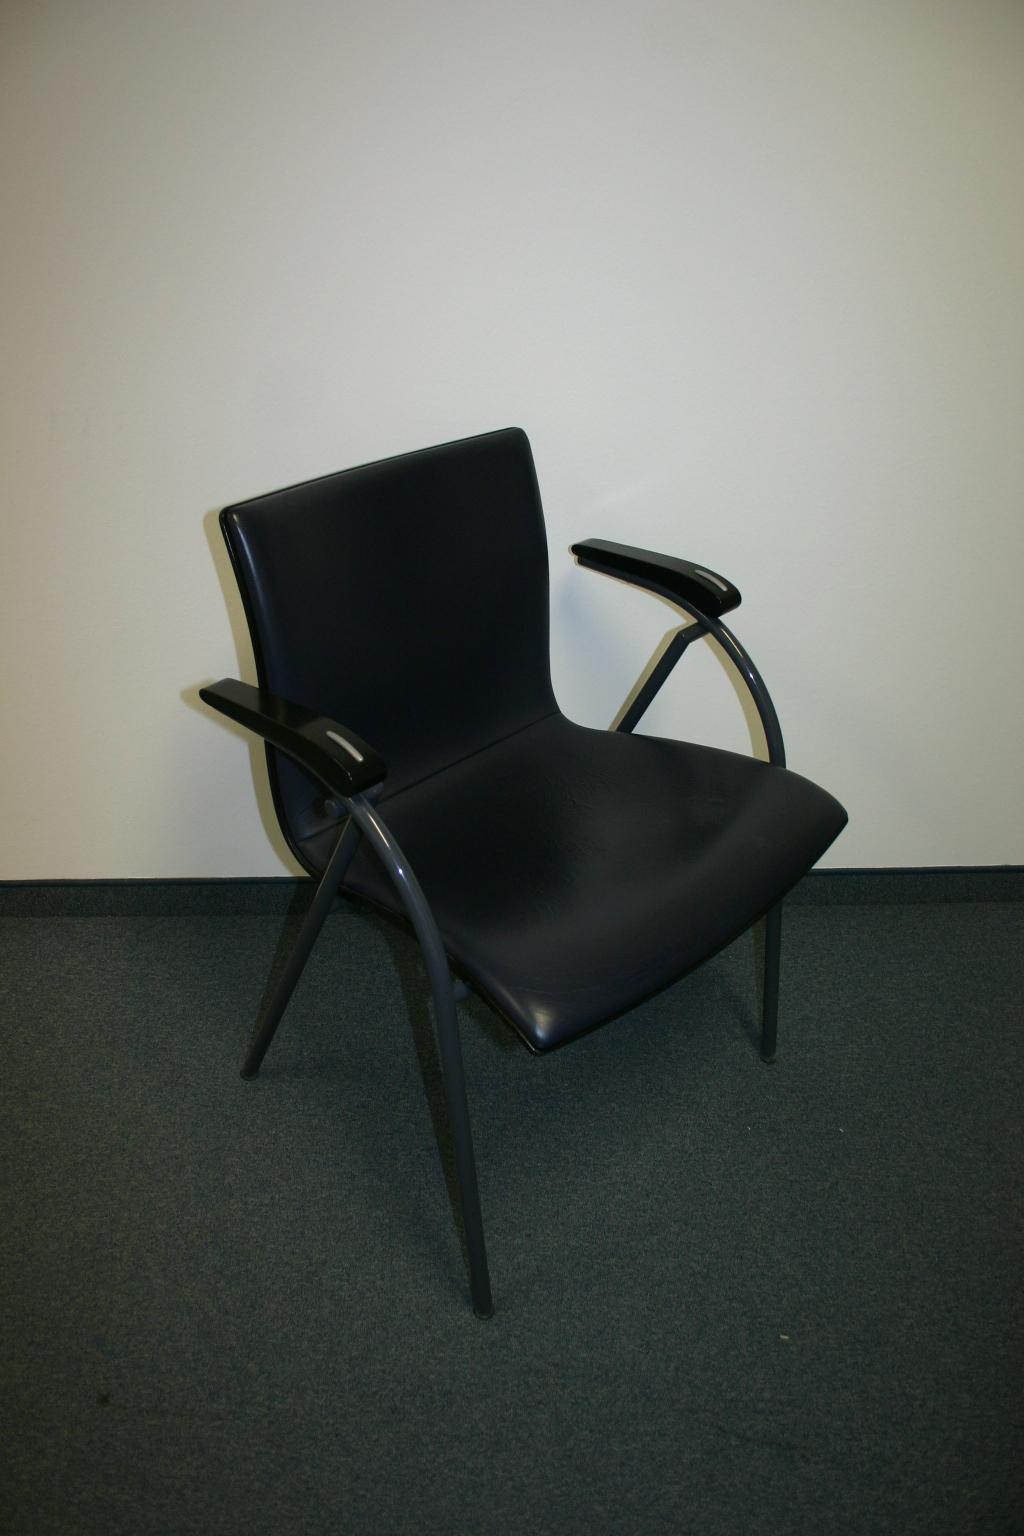 stapelstuhl s570 mit lederpolster von thonet. Black Bedroom Furniture Sets. Home Design Ideas